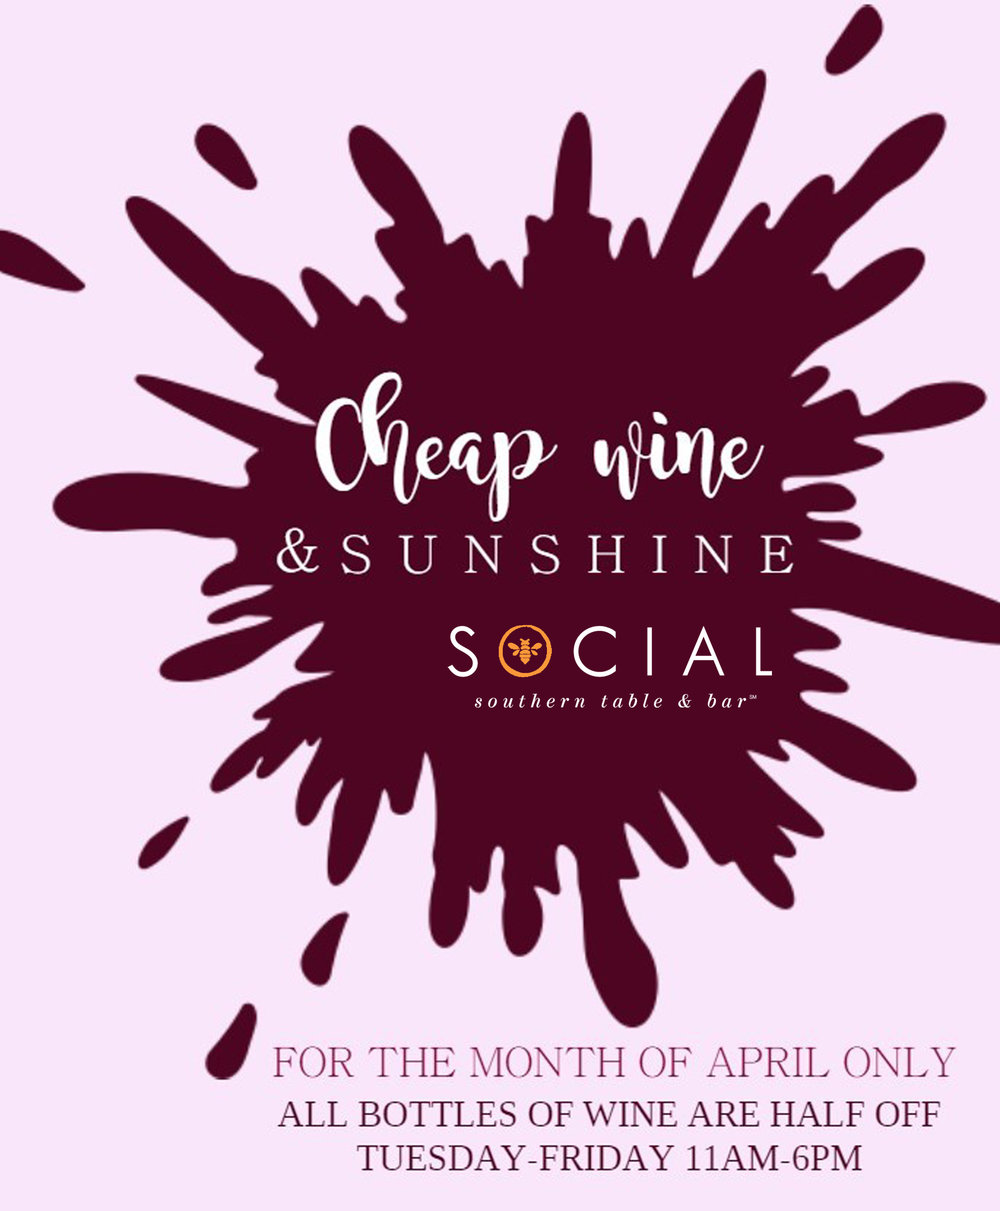 Cheap wine and sunshine flyer copy.jpg